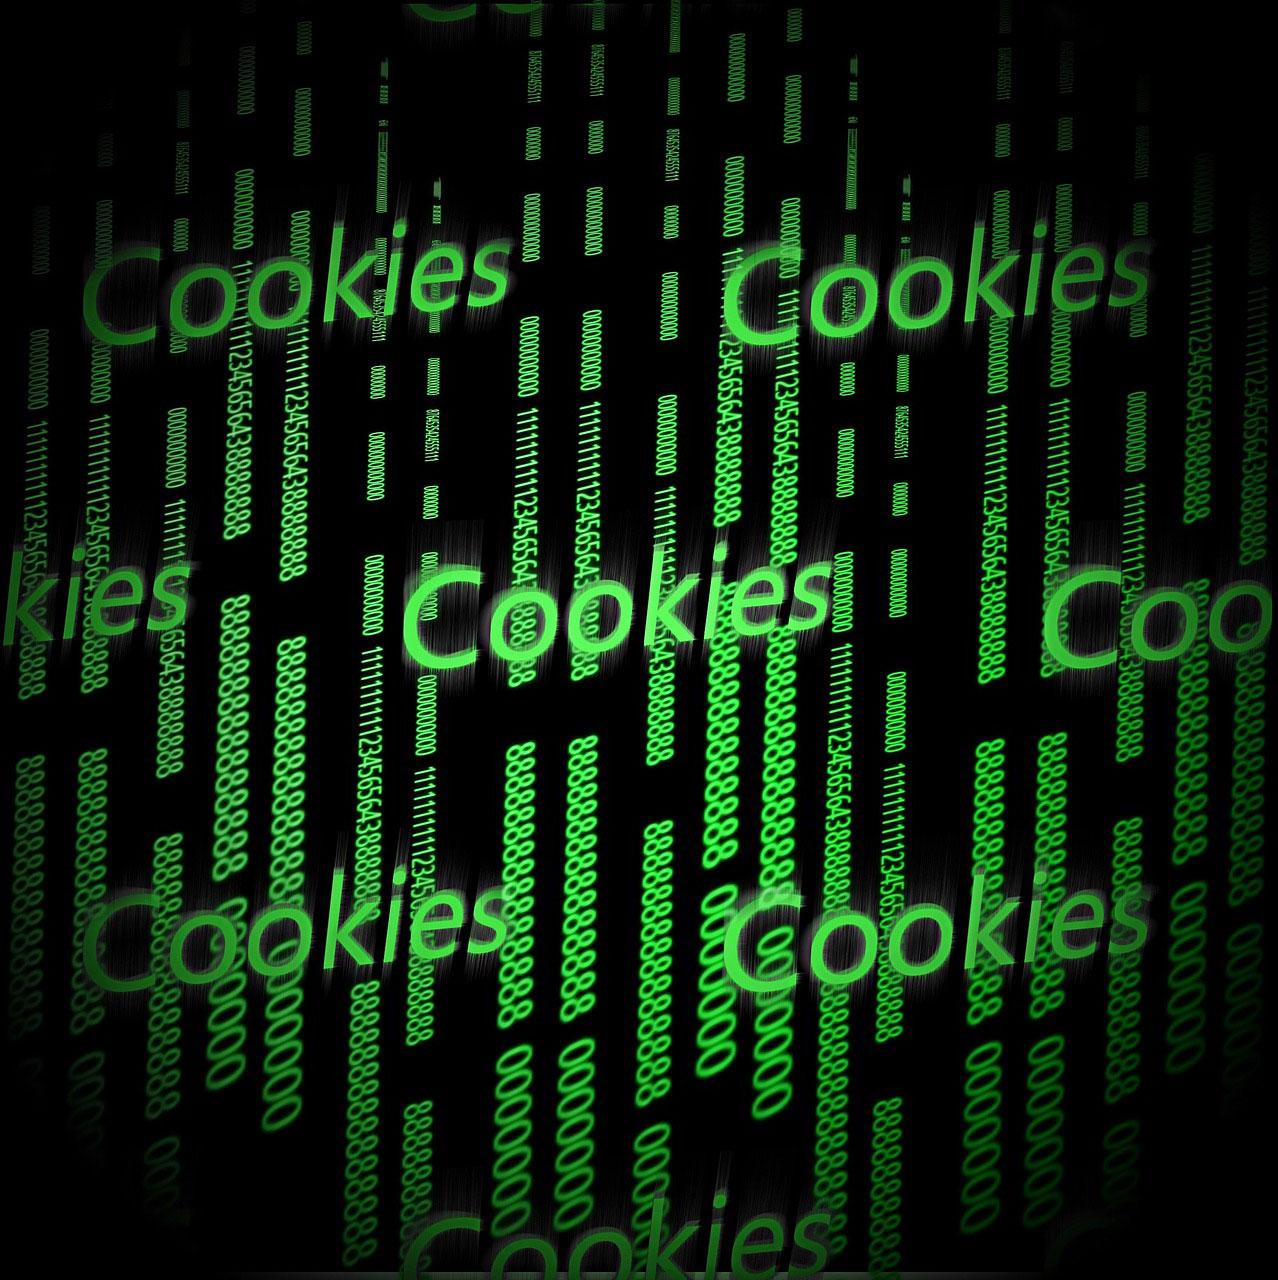 Apa Itu Cookie? - mingseli.id